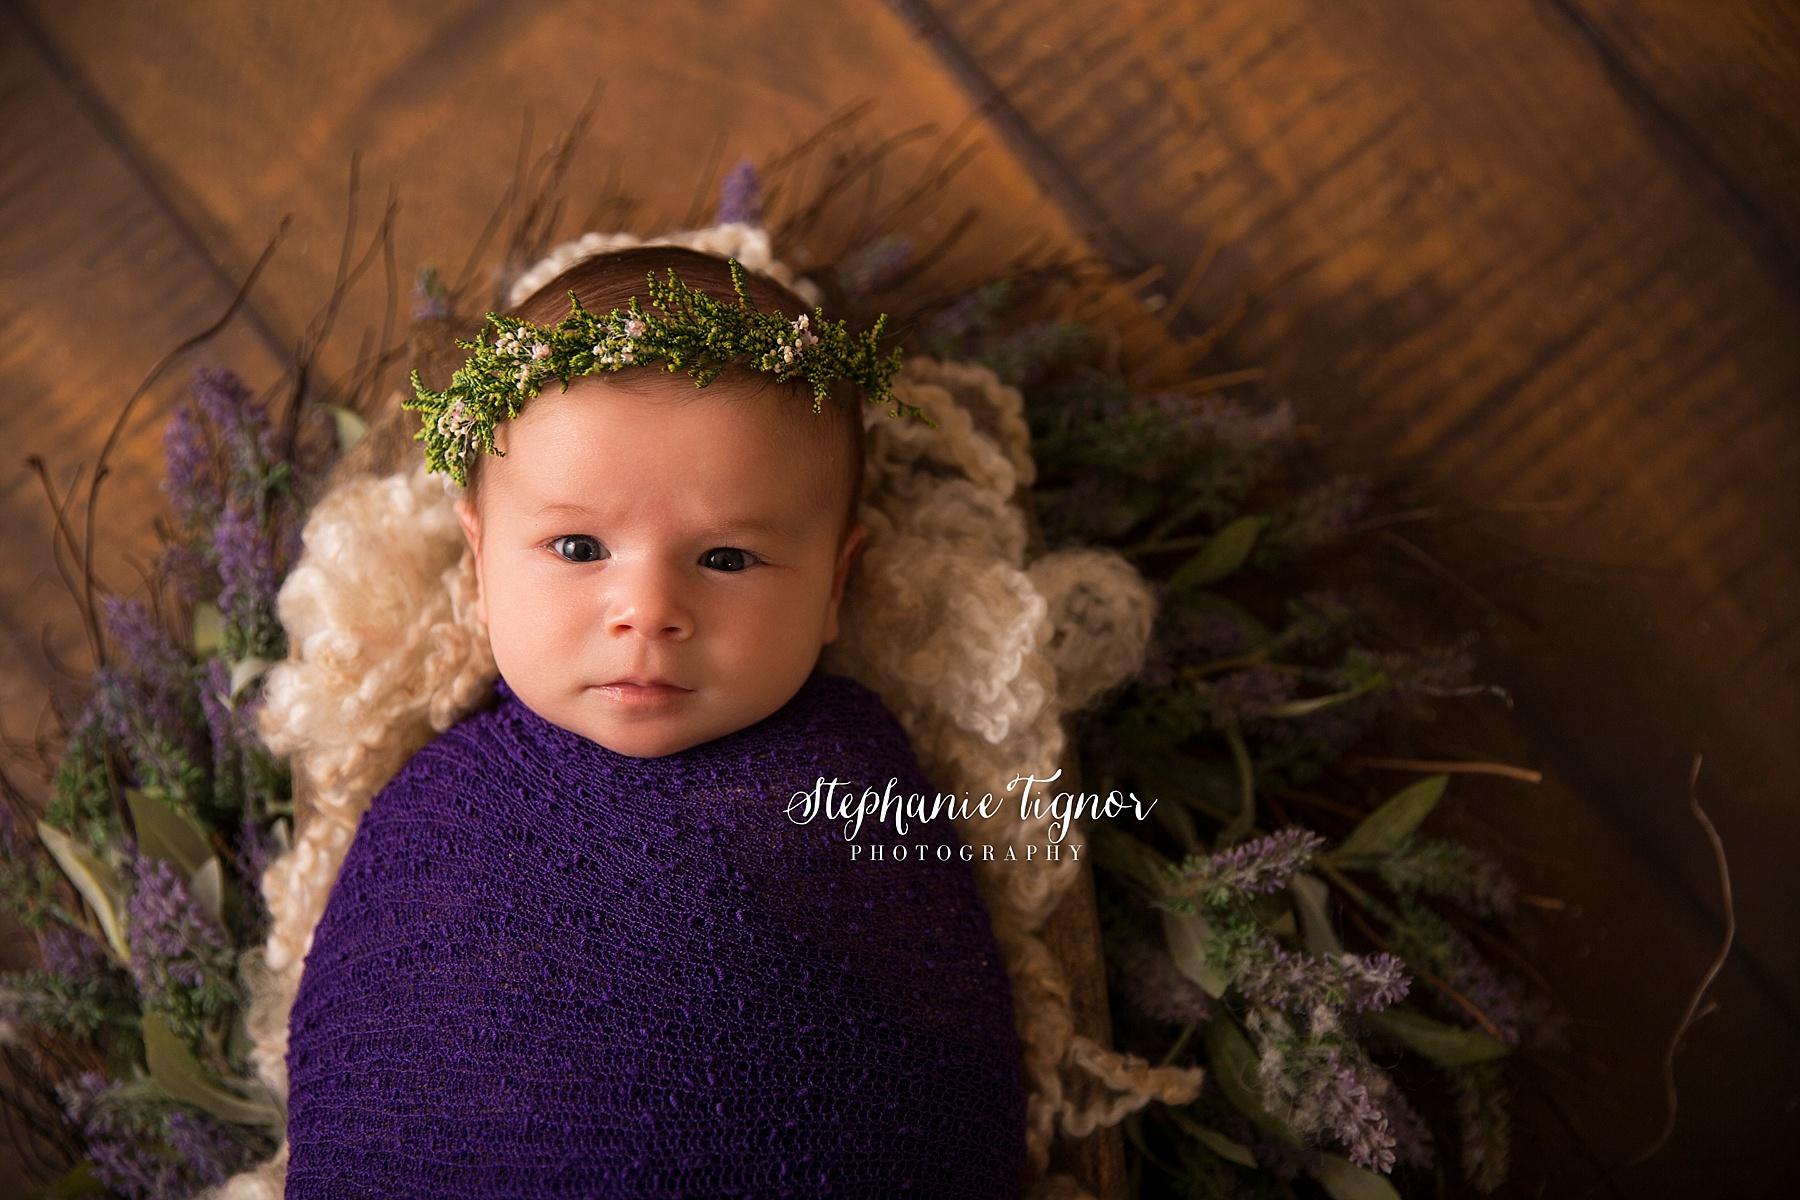 Stephanie Tignor Photography | Fredericksburg VA Newborn Photographer | Warrenton VA Newborn Photographer | Stafford VA Newborn Photographer | Newborn Photographer, swaddle newborn session, swaddled baby, swaddled newborn, baby photos